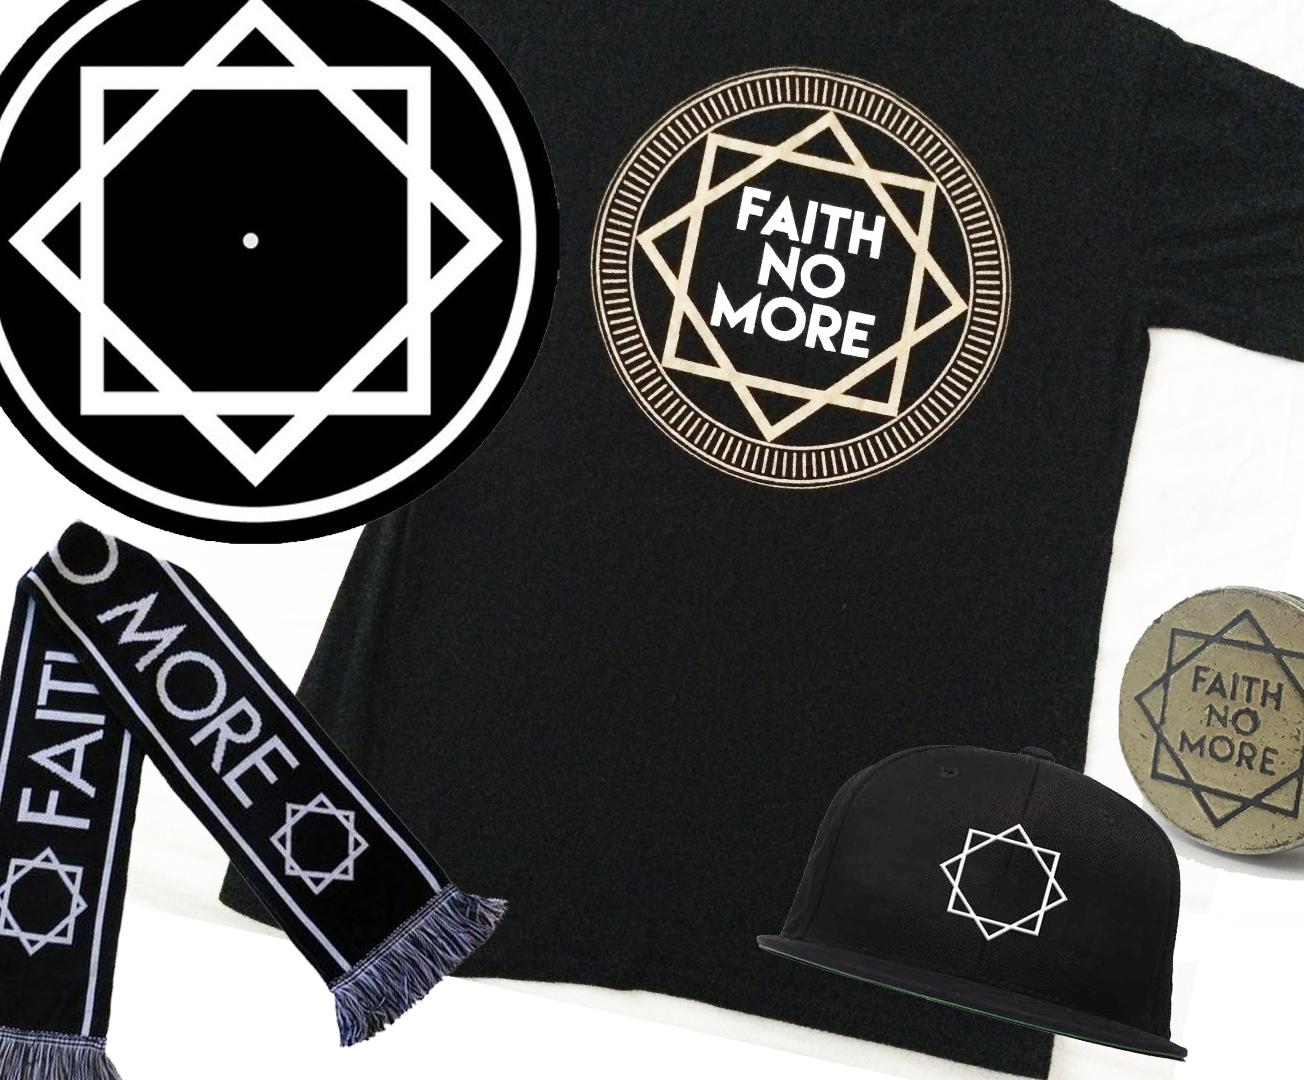 History of the FAITH NO MORE Star logo.